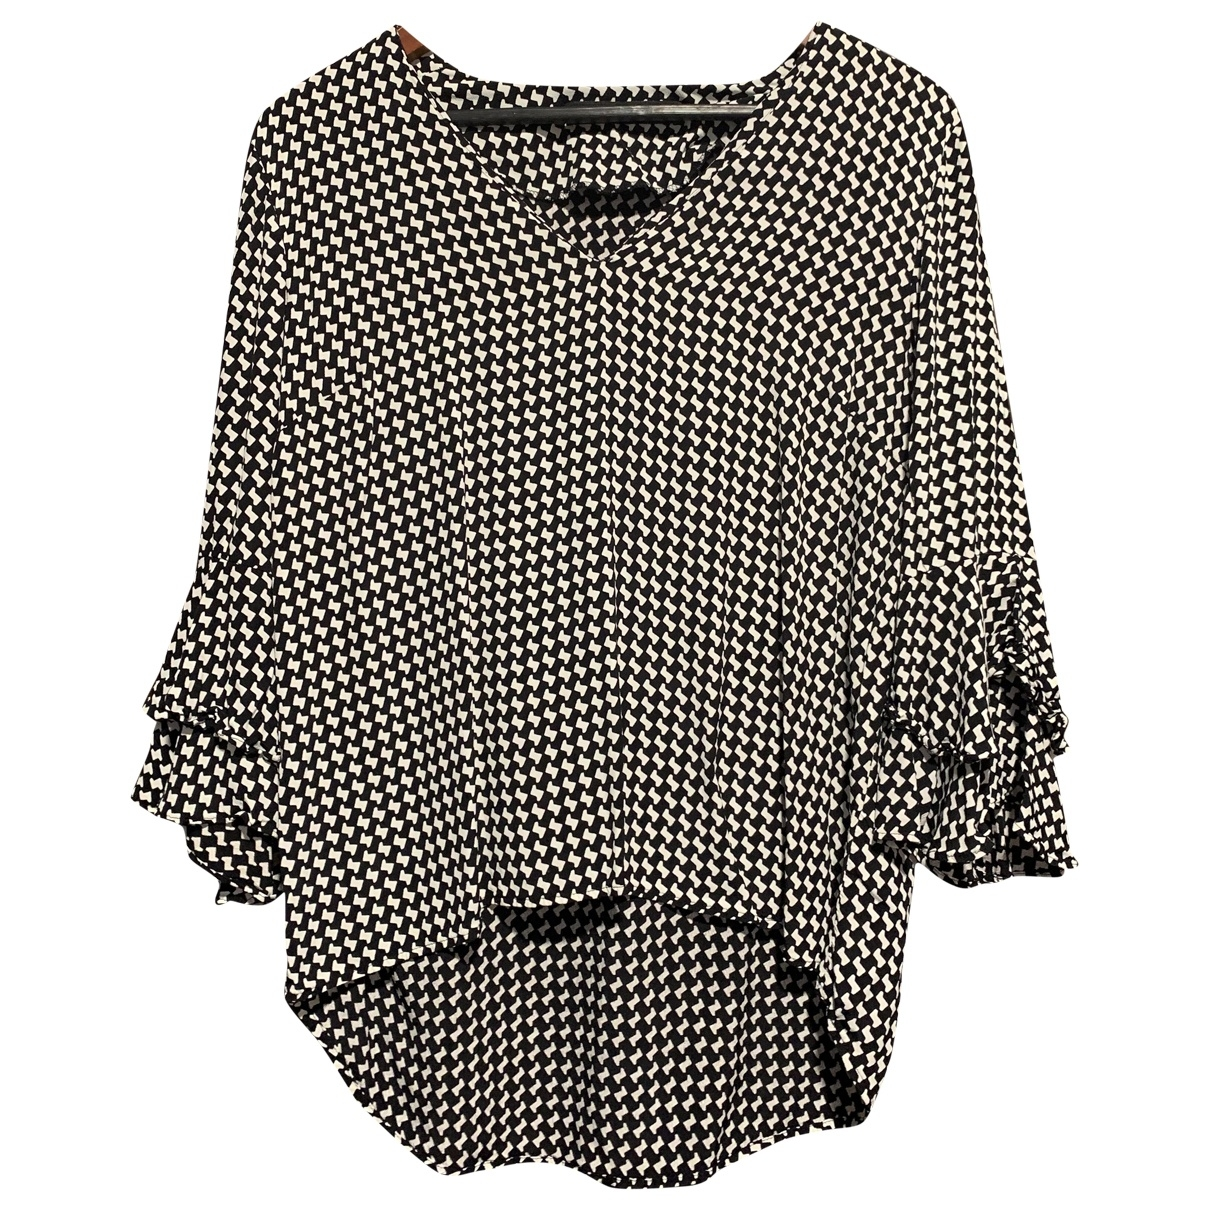 Zara \N Black  top for Women M International